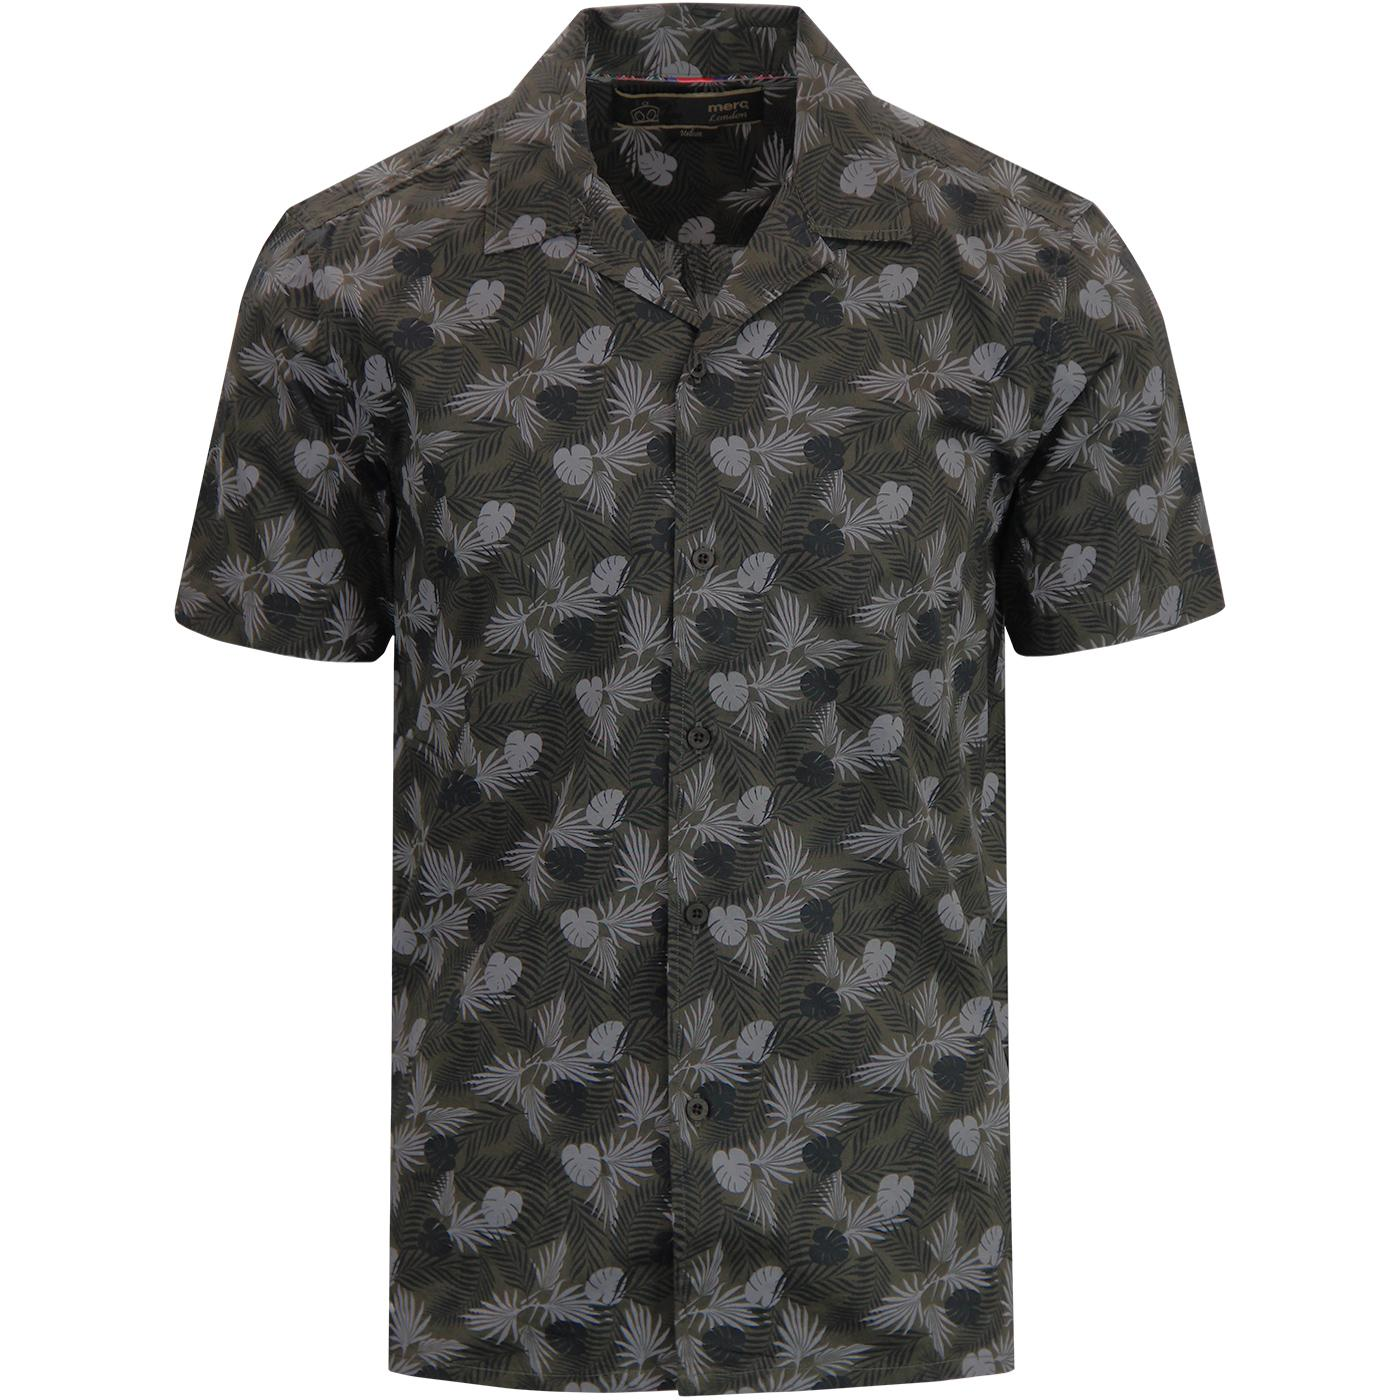 Darwin MERC Retro Cuban Collar Botanical Shirt DS